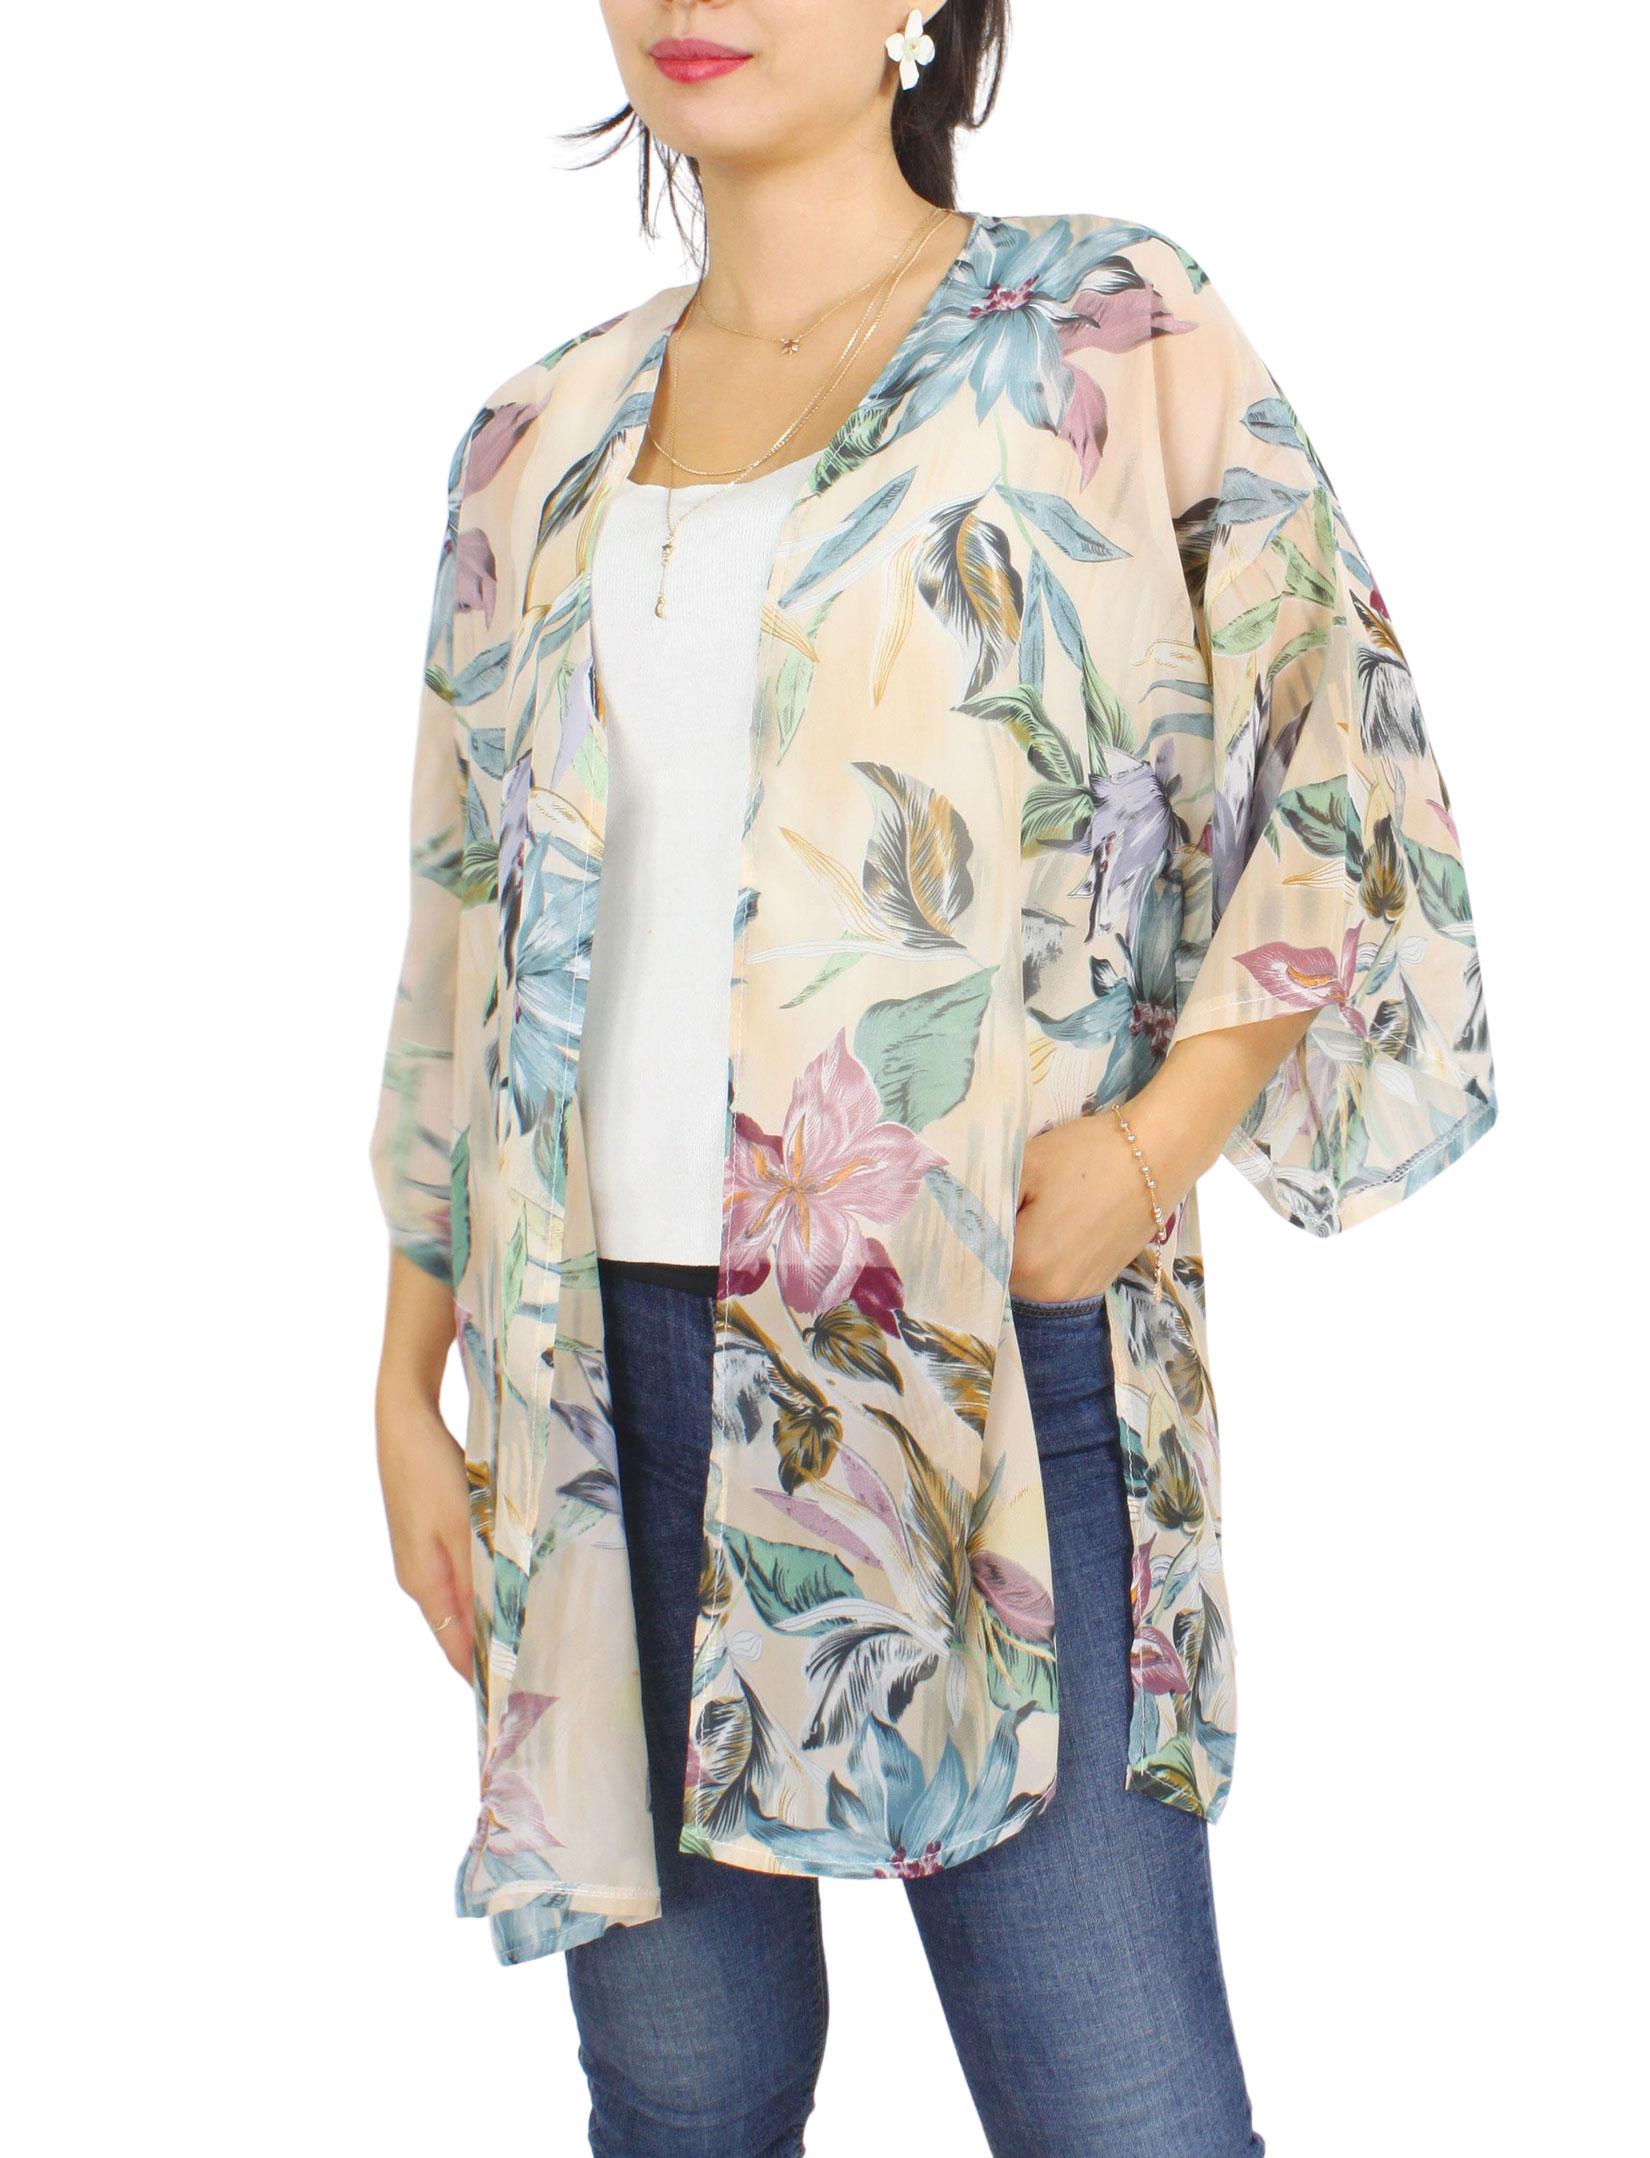 Kimono - Floral and Leaf Print 9948